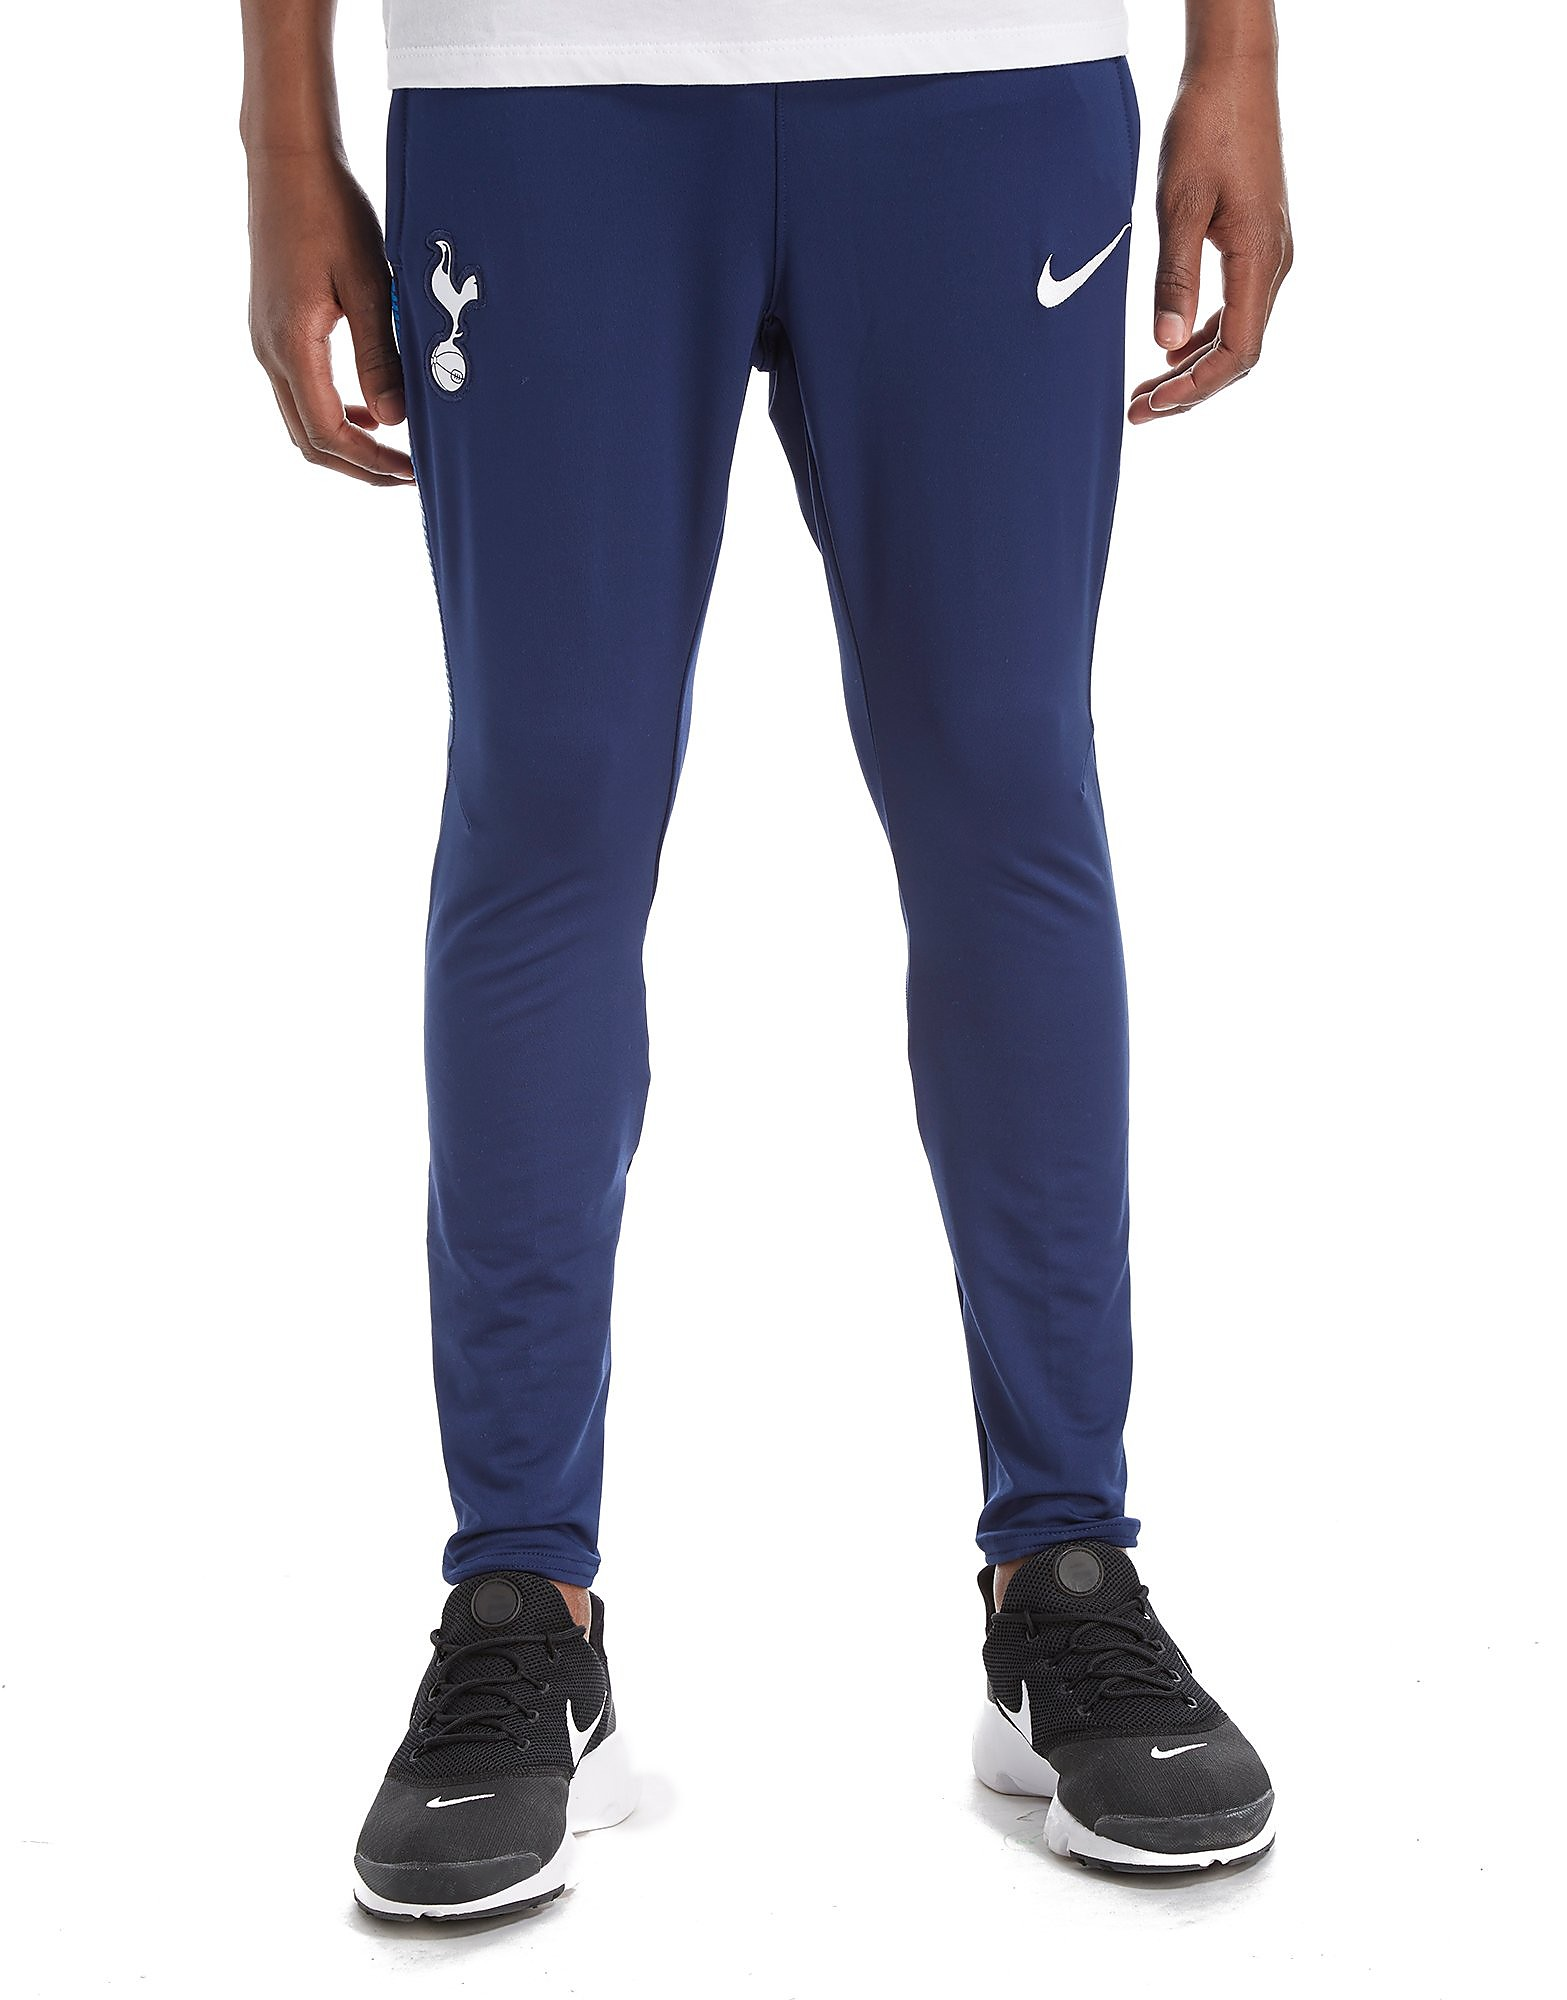 Nike Tottenham Hotspur 2017 Squad Pants Junior